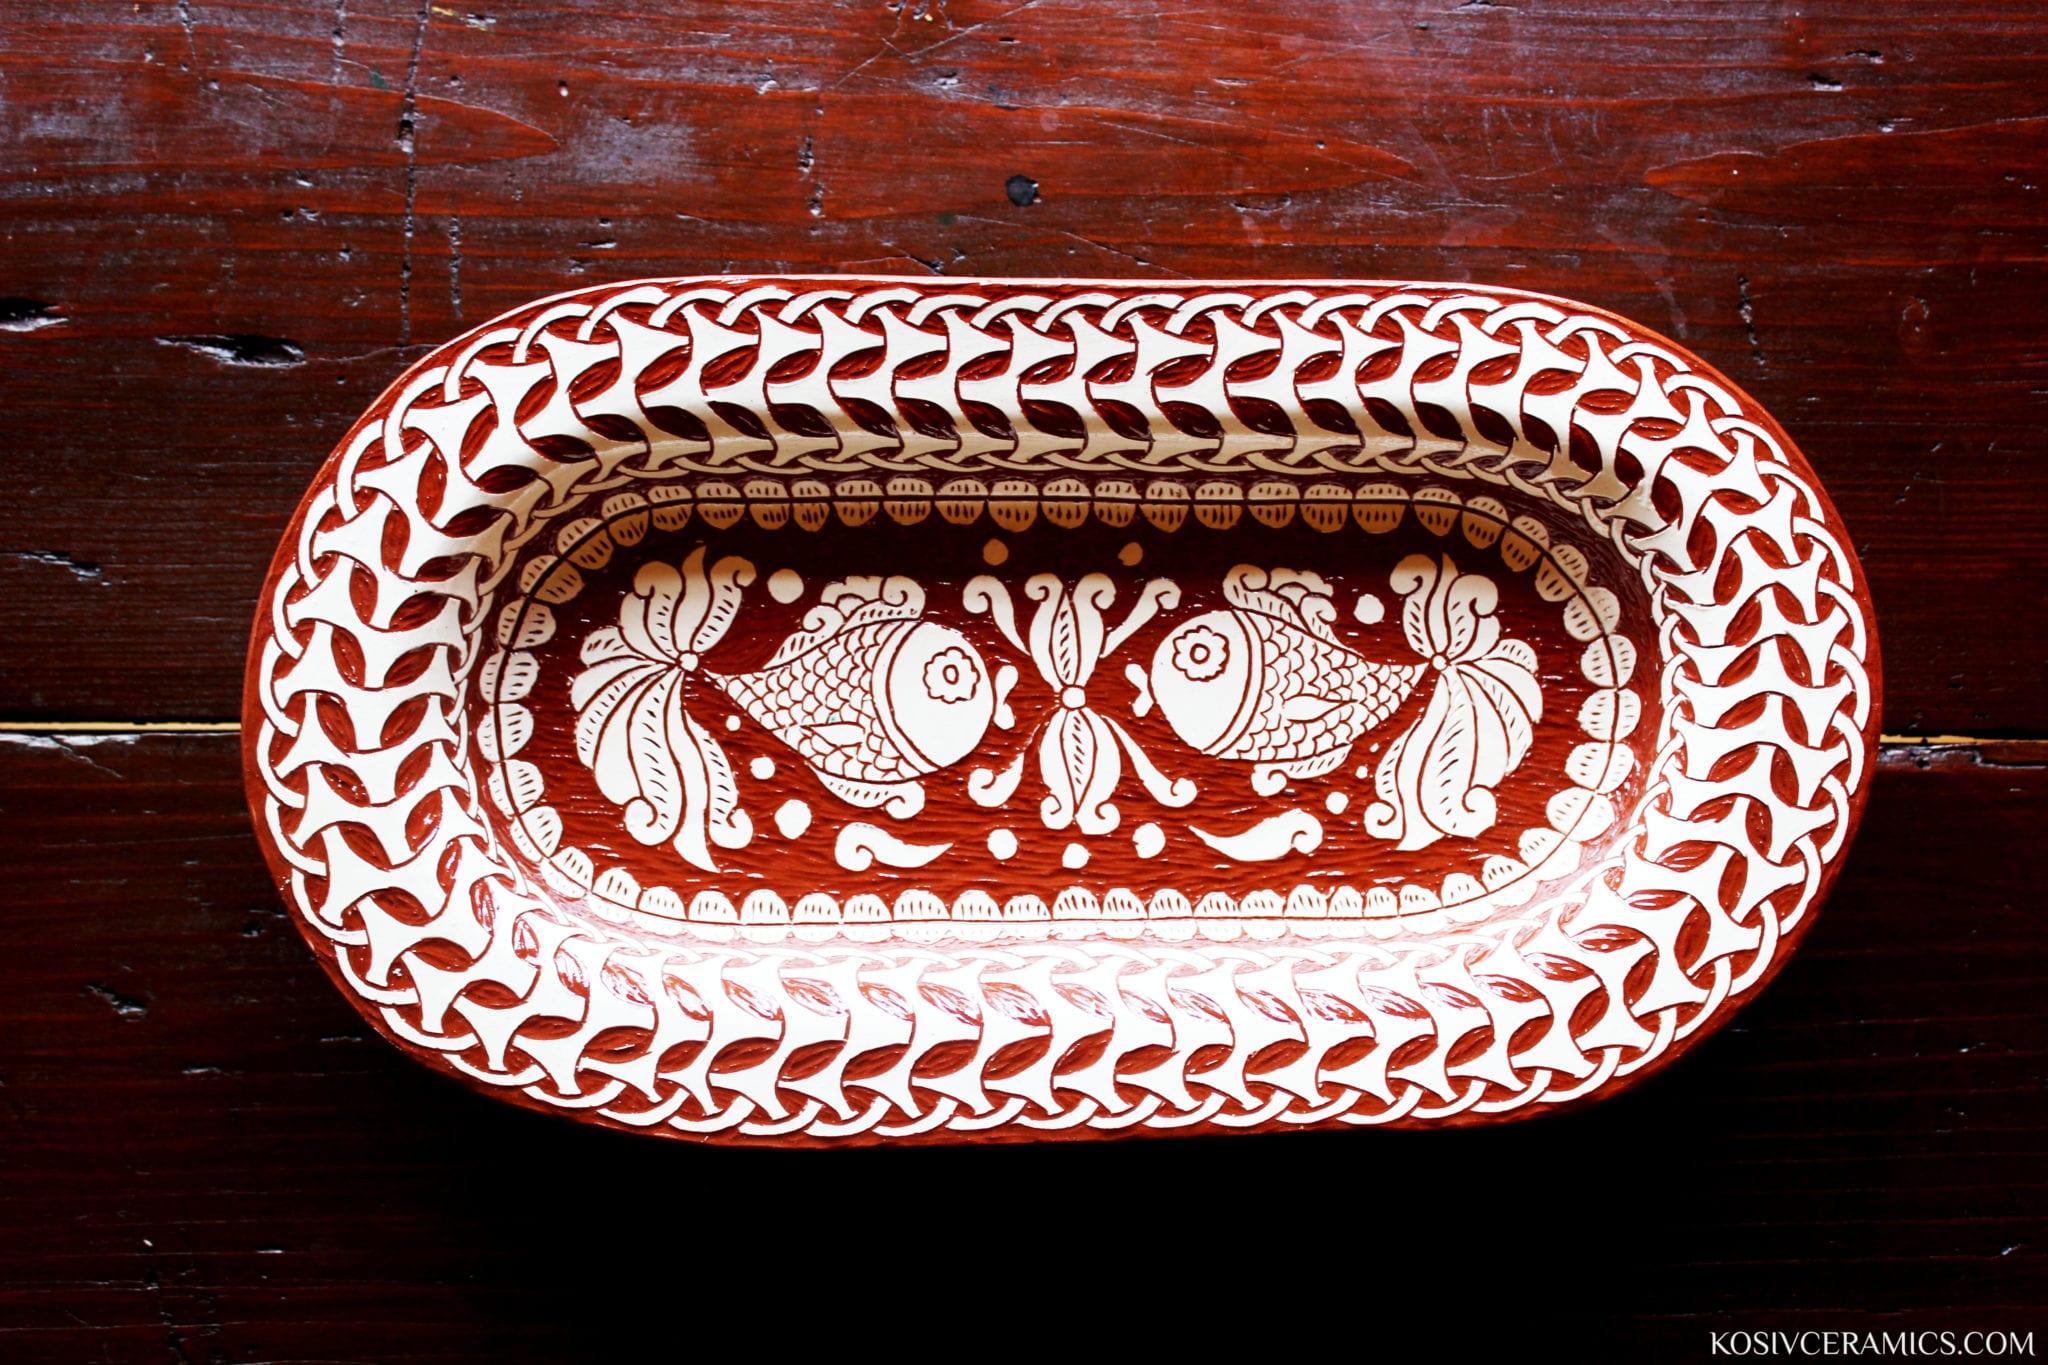 тарілка, кераміка, ручна робота, кераміка ручної роботи, троць, косівська кераміка, гуцульська кераміка, кераміка троць, kosiv ceramics, sgraffito, ceramics